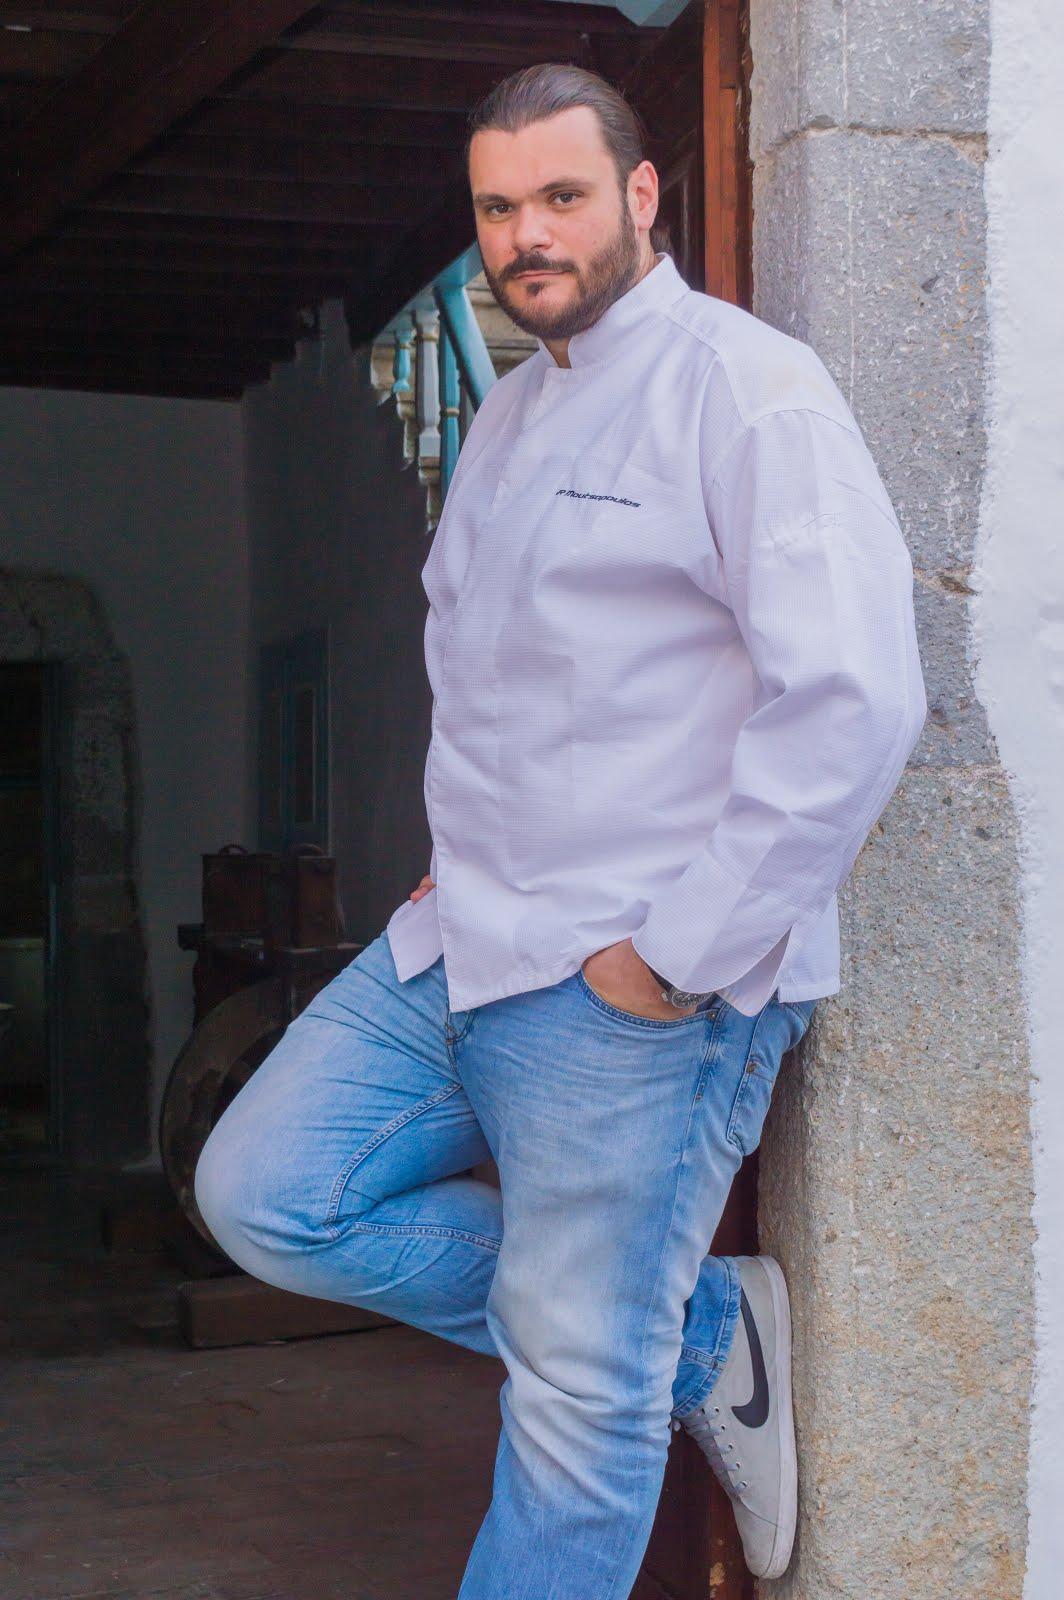 O Chef Παναγιώτης Μουτσόπουλος, προτείνει